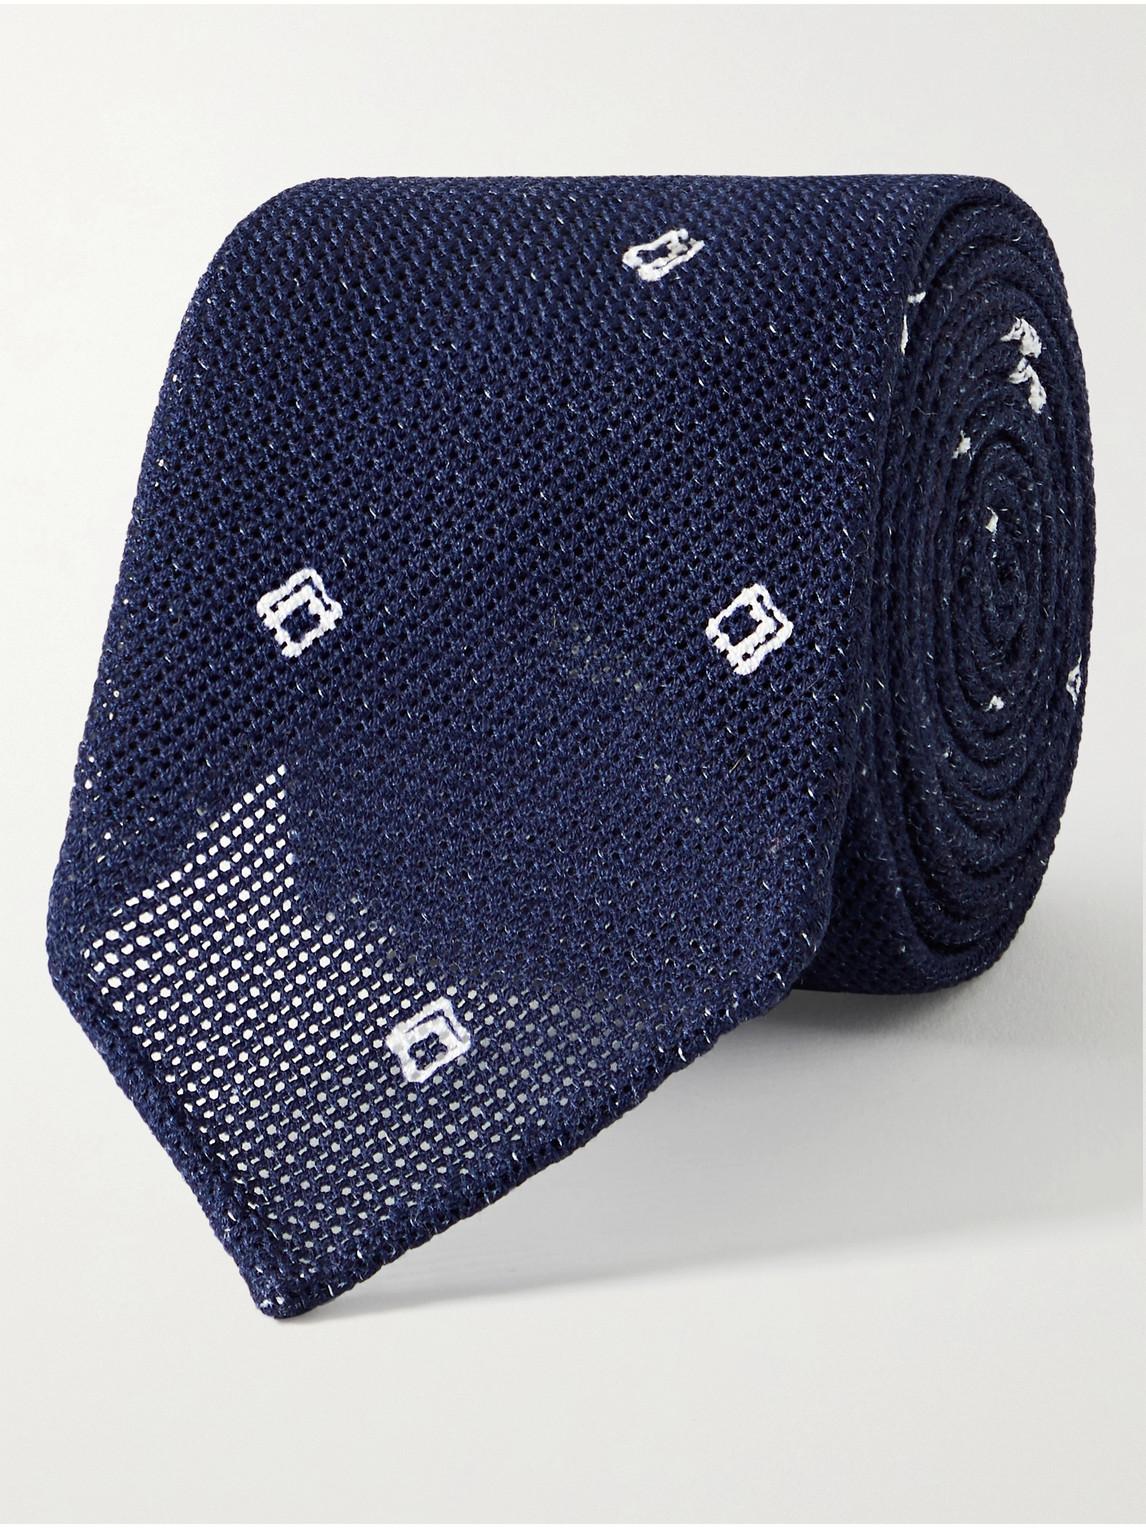 sid mashburn - 8cm embroidered cotton-mesh tie - men - blue